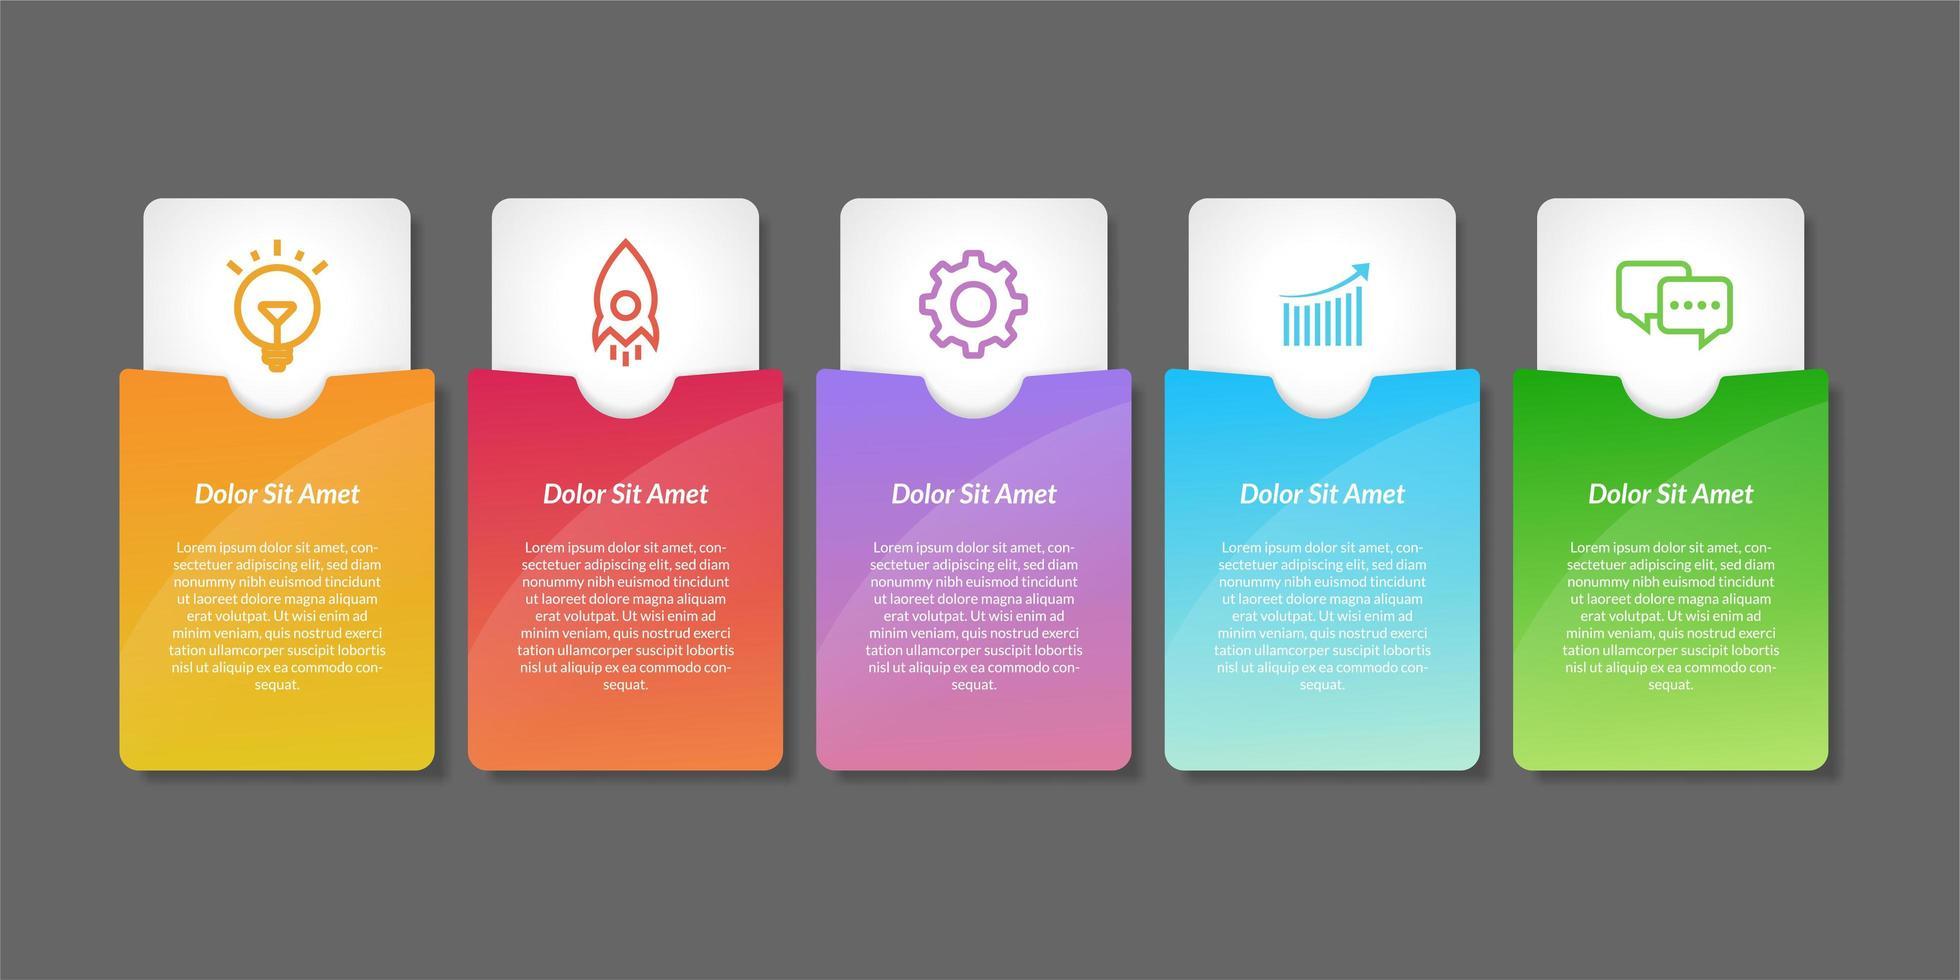 färgglada etikett infographic designelement vektor